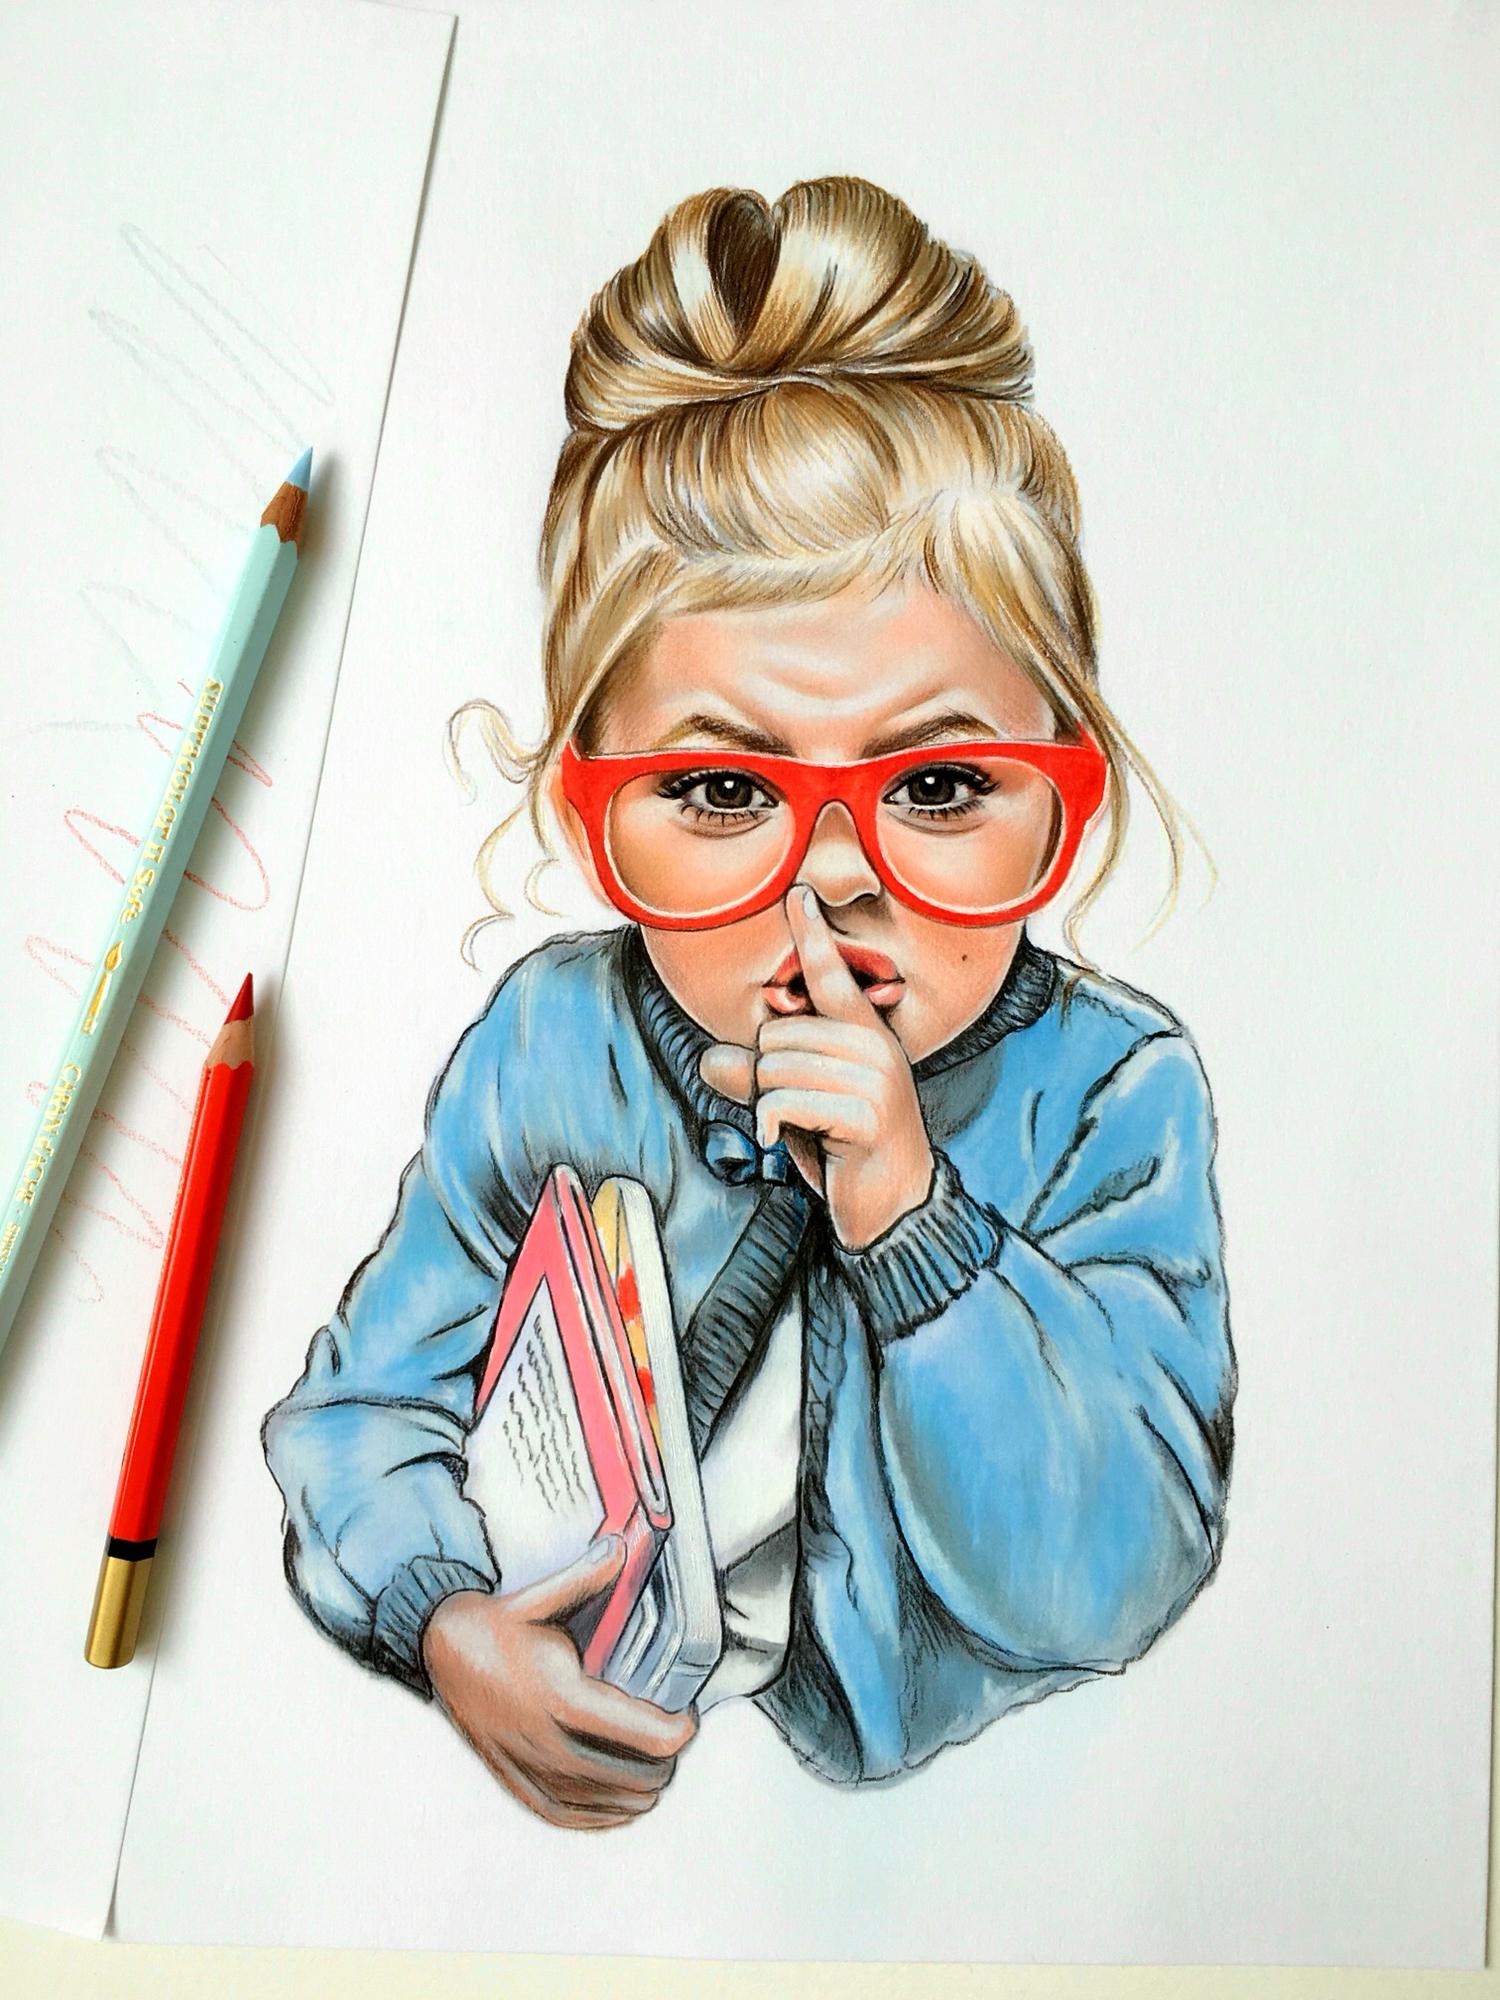 Drawn sanya pencil Drawing Vasilyeva Portraits Pinterest by